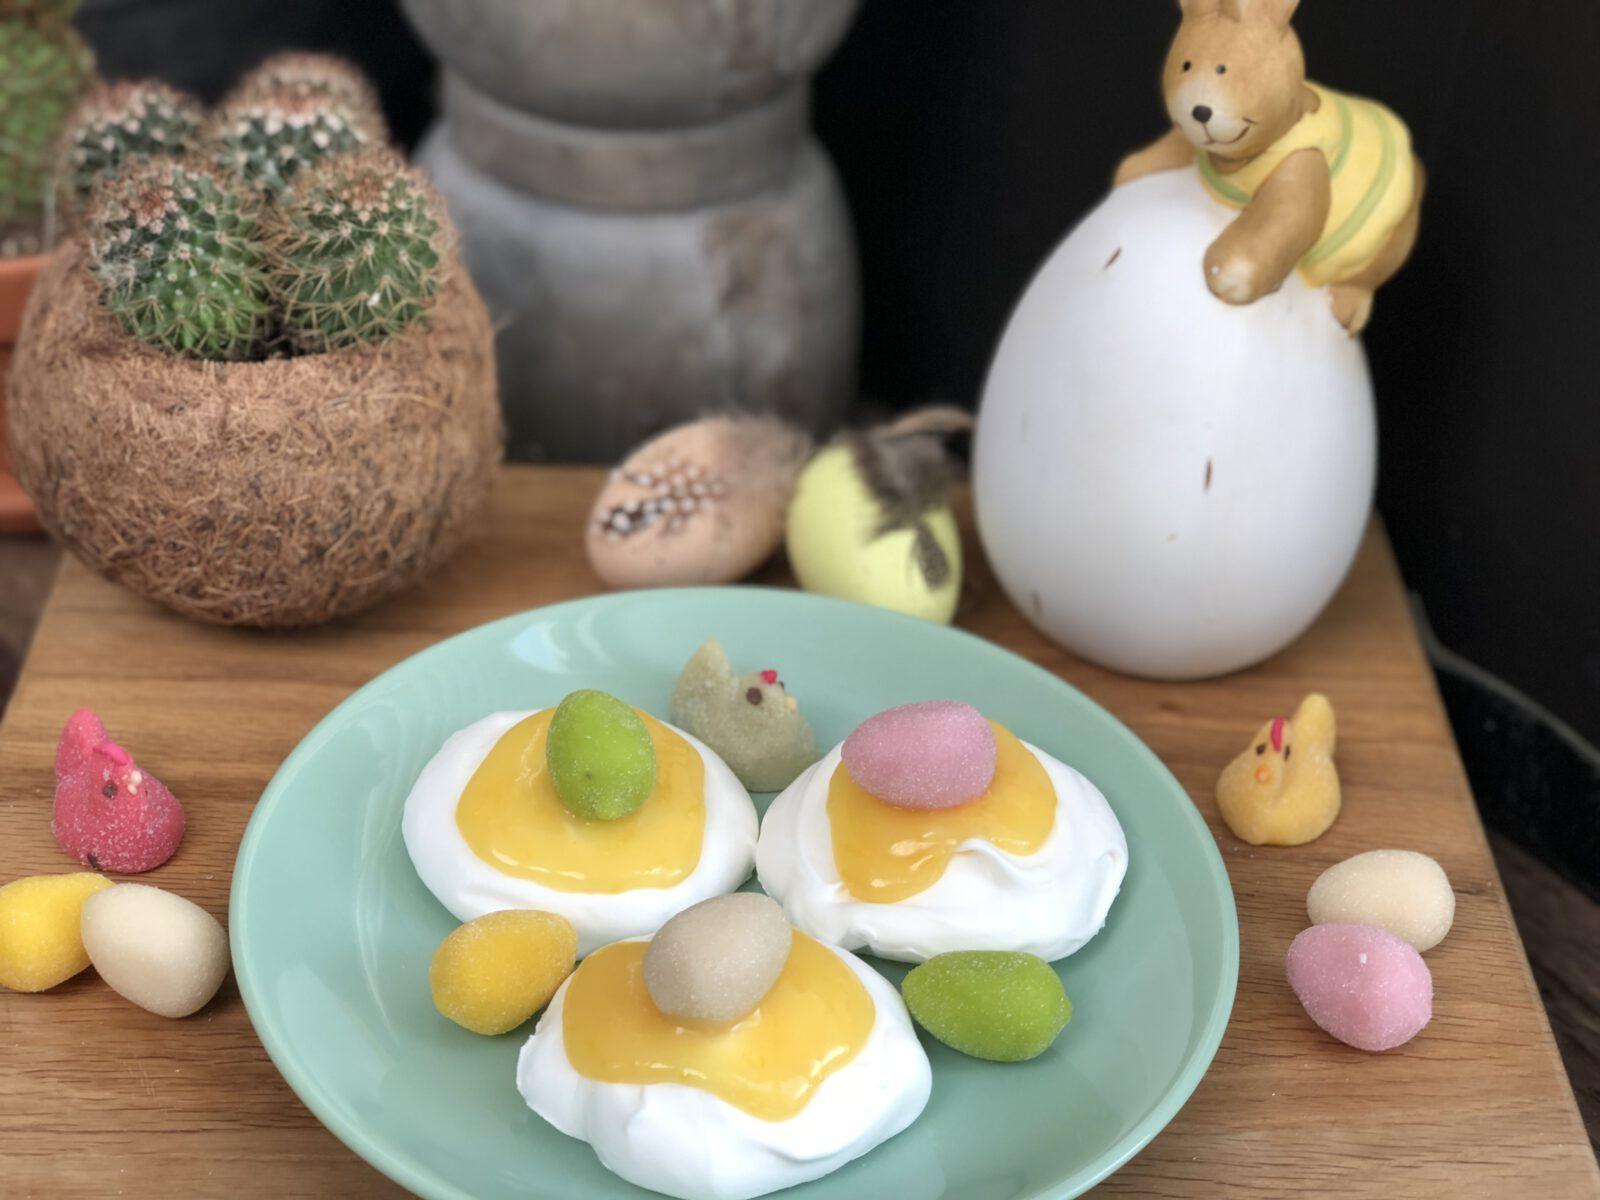 Paastoetje: meringues met diverse toppings - Familie over de kook